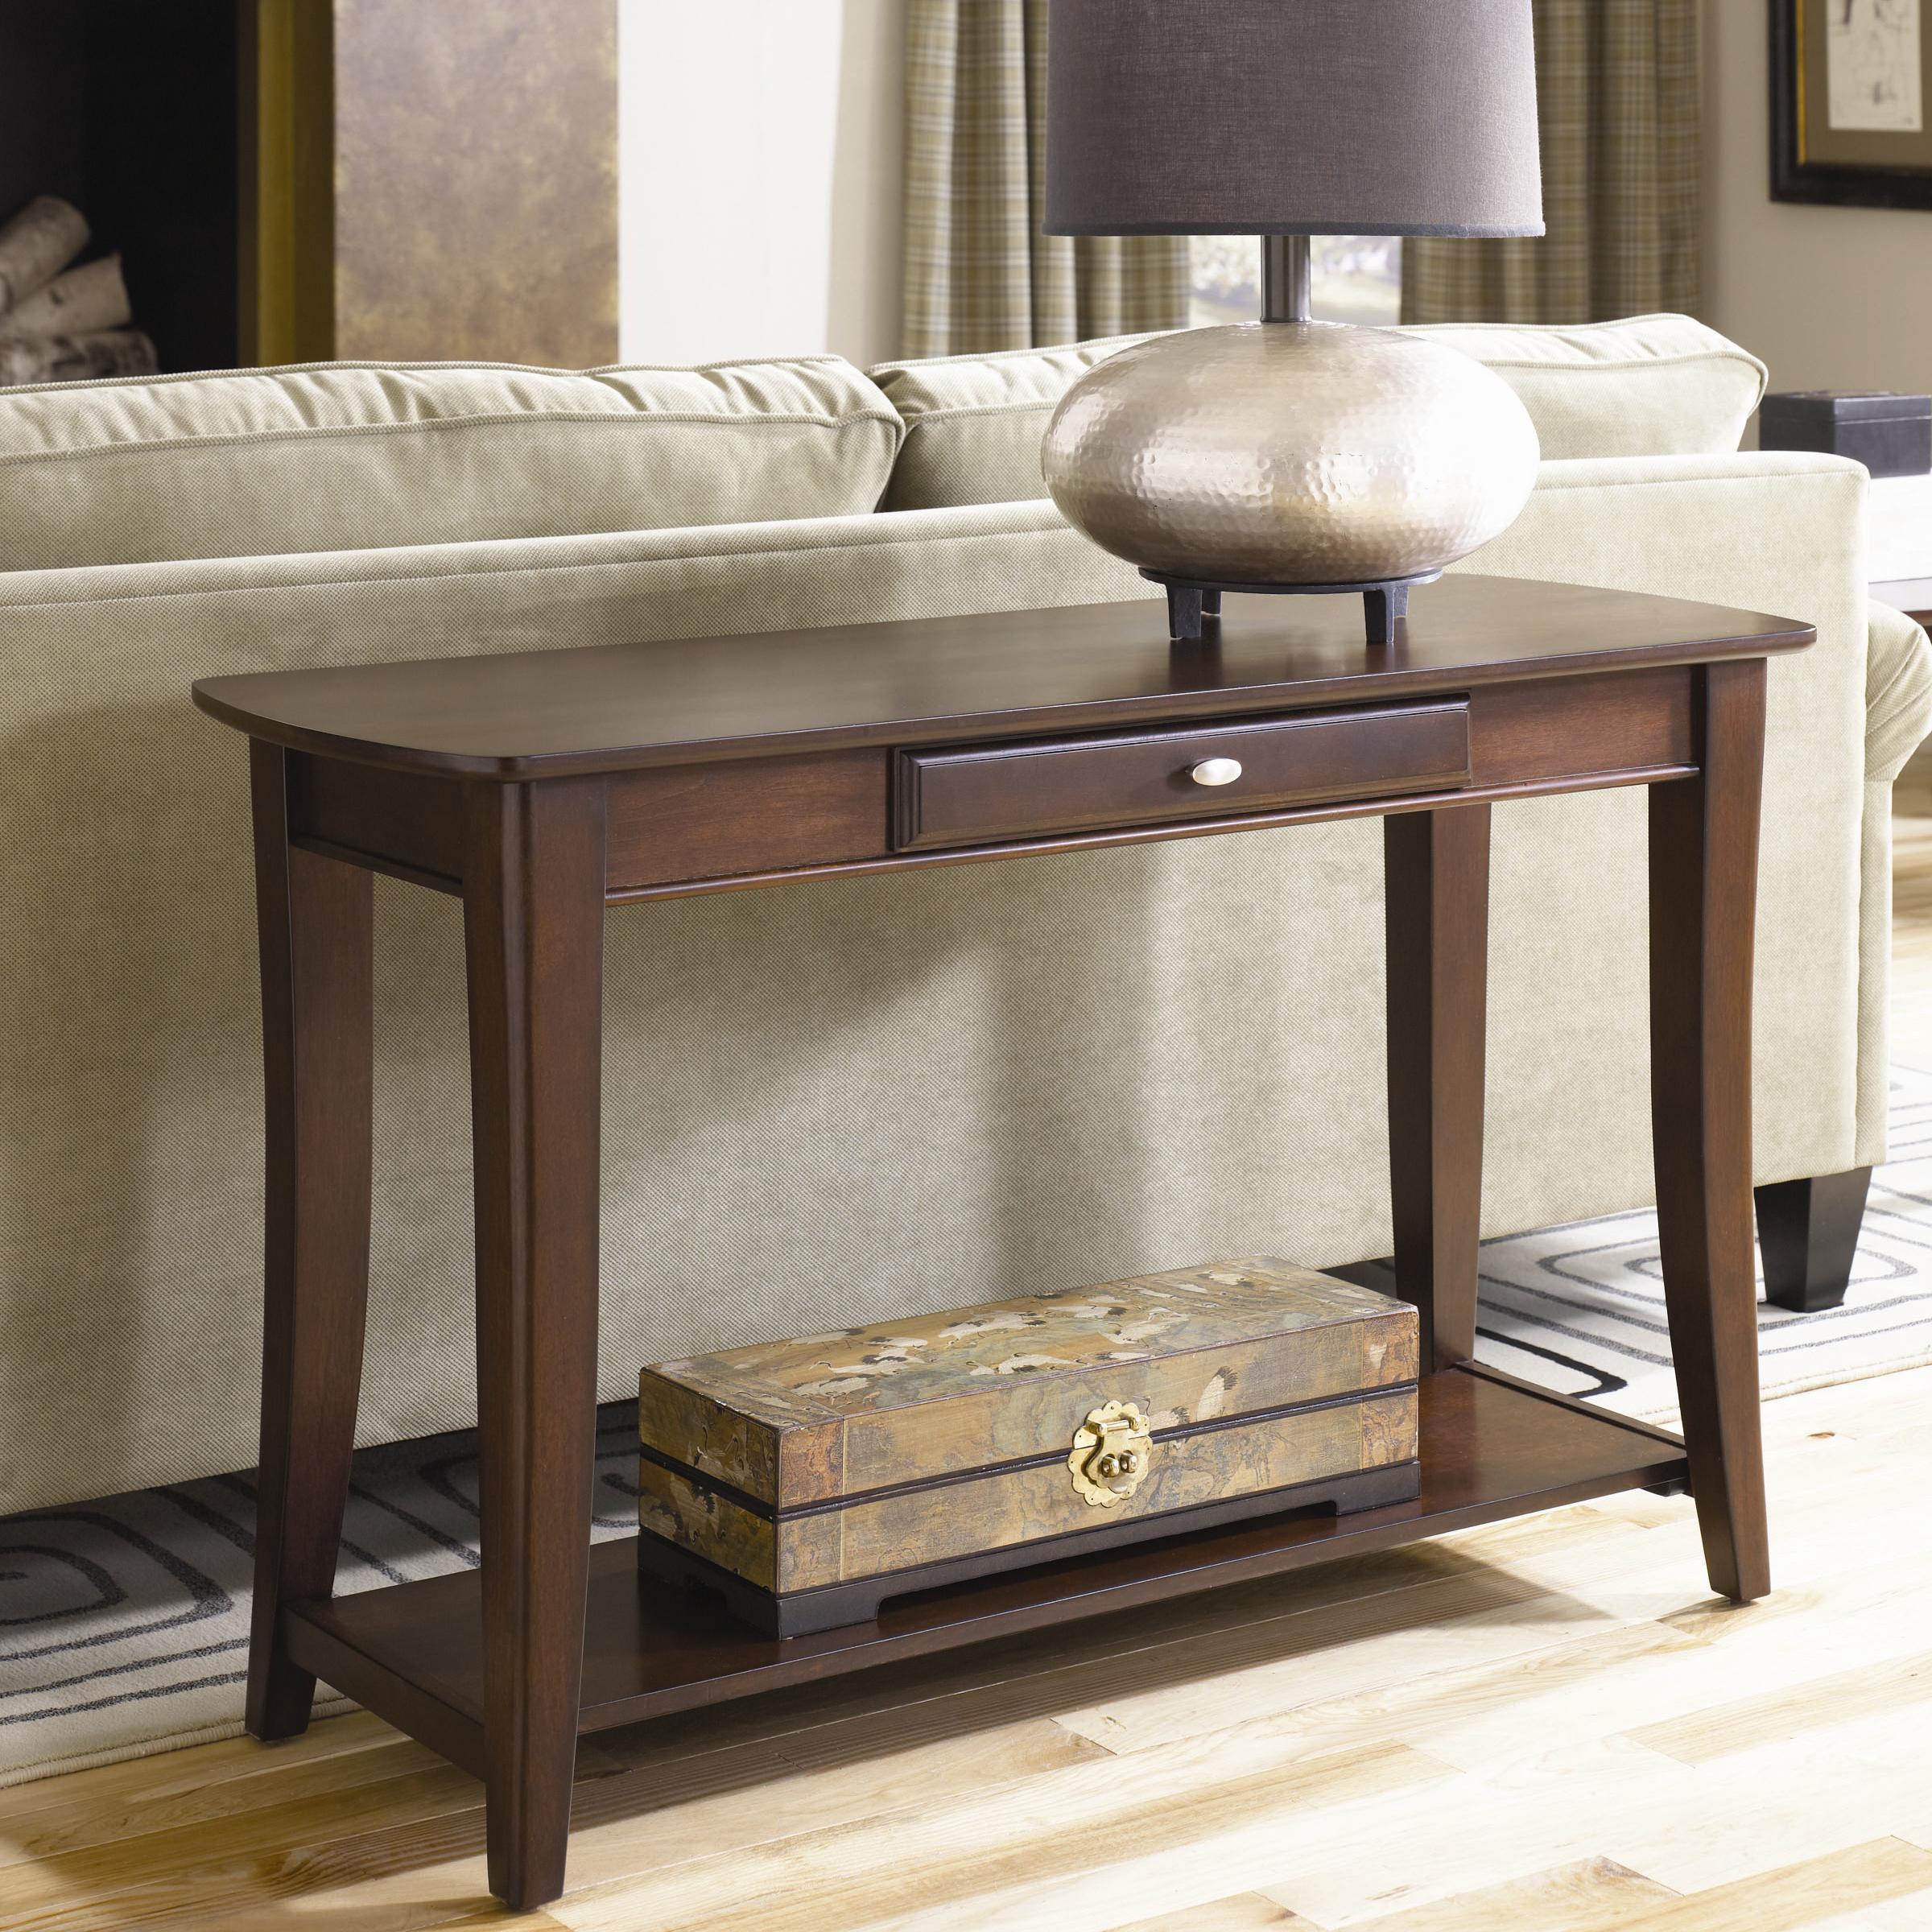 Hammary Enclave HAM Rectangular Sofa Table - Item Number: T2079289-00